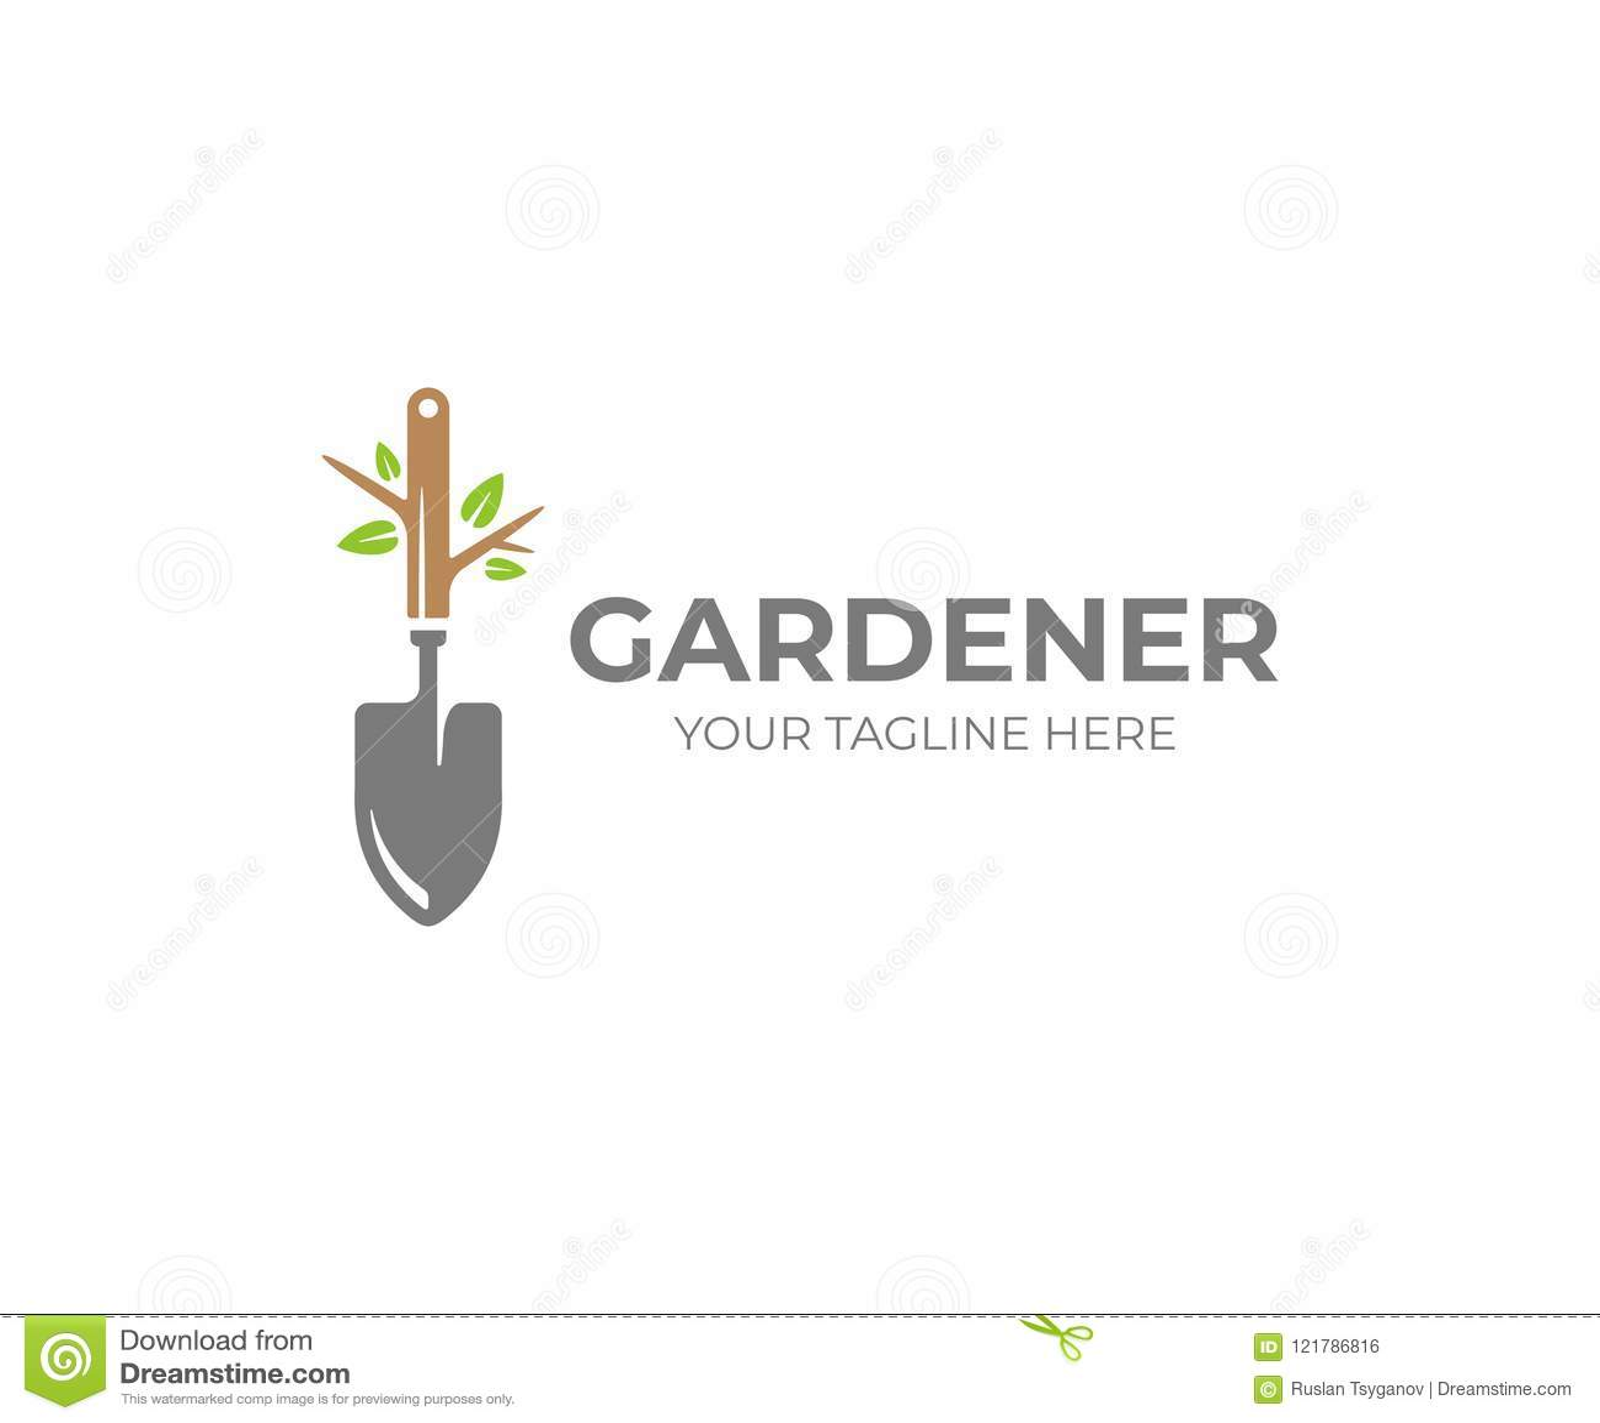 Garden shovel and tree with green leaves logo template. Gardening plant, garden tool vector design